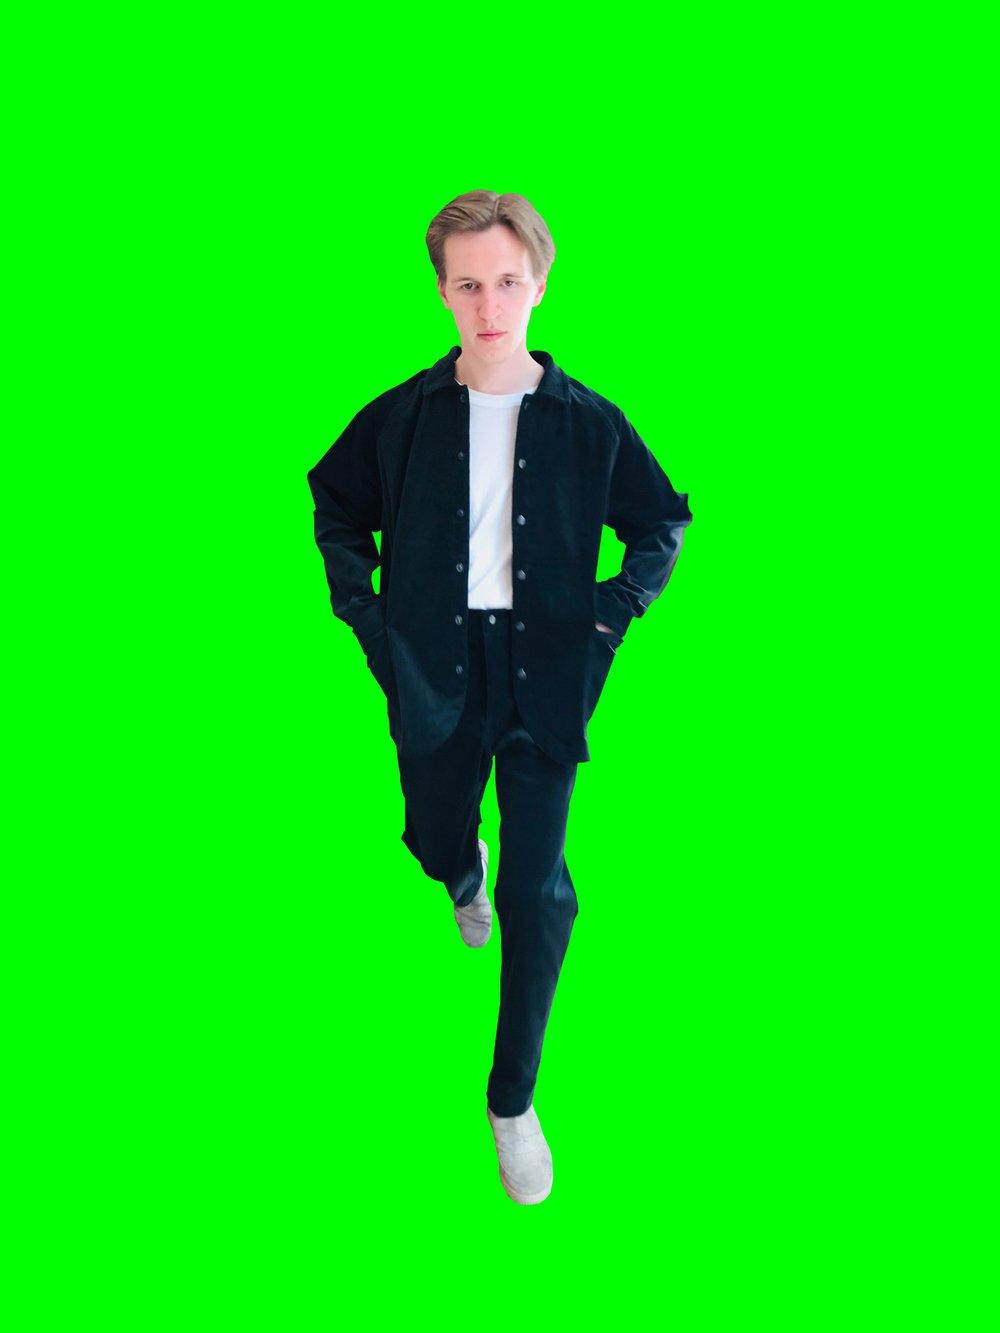 Image of Maja Brix & Aarstiderne - UNISEX FULL SET - Dark Green Corduroy